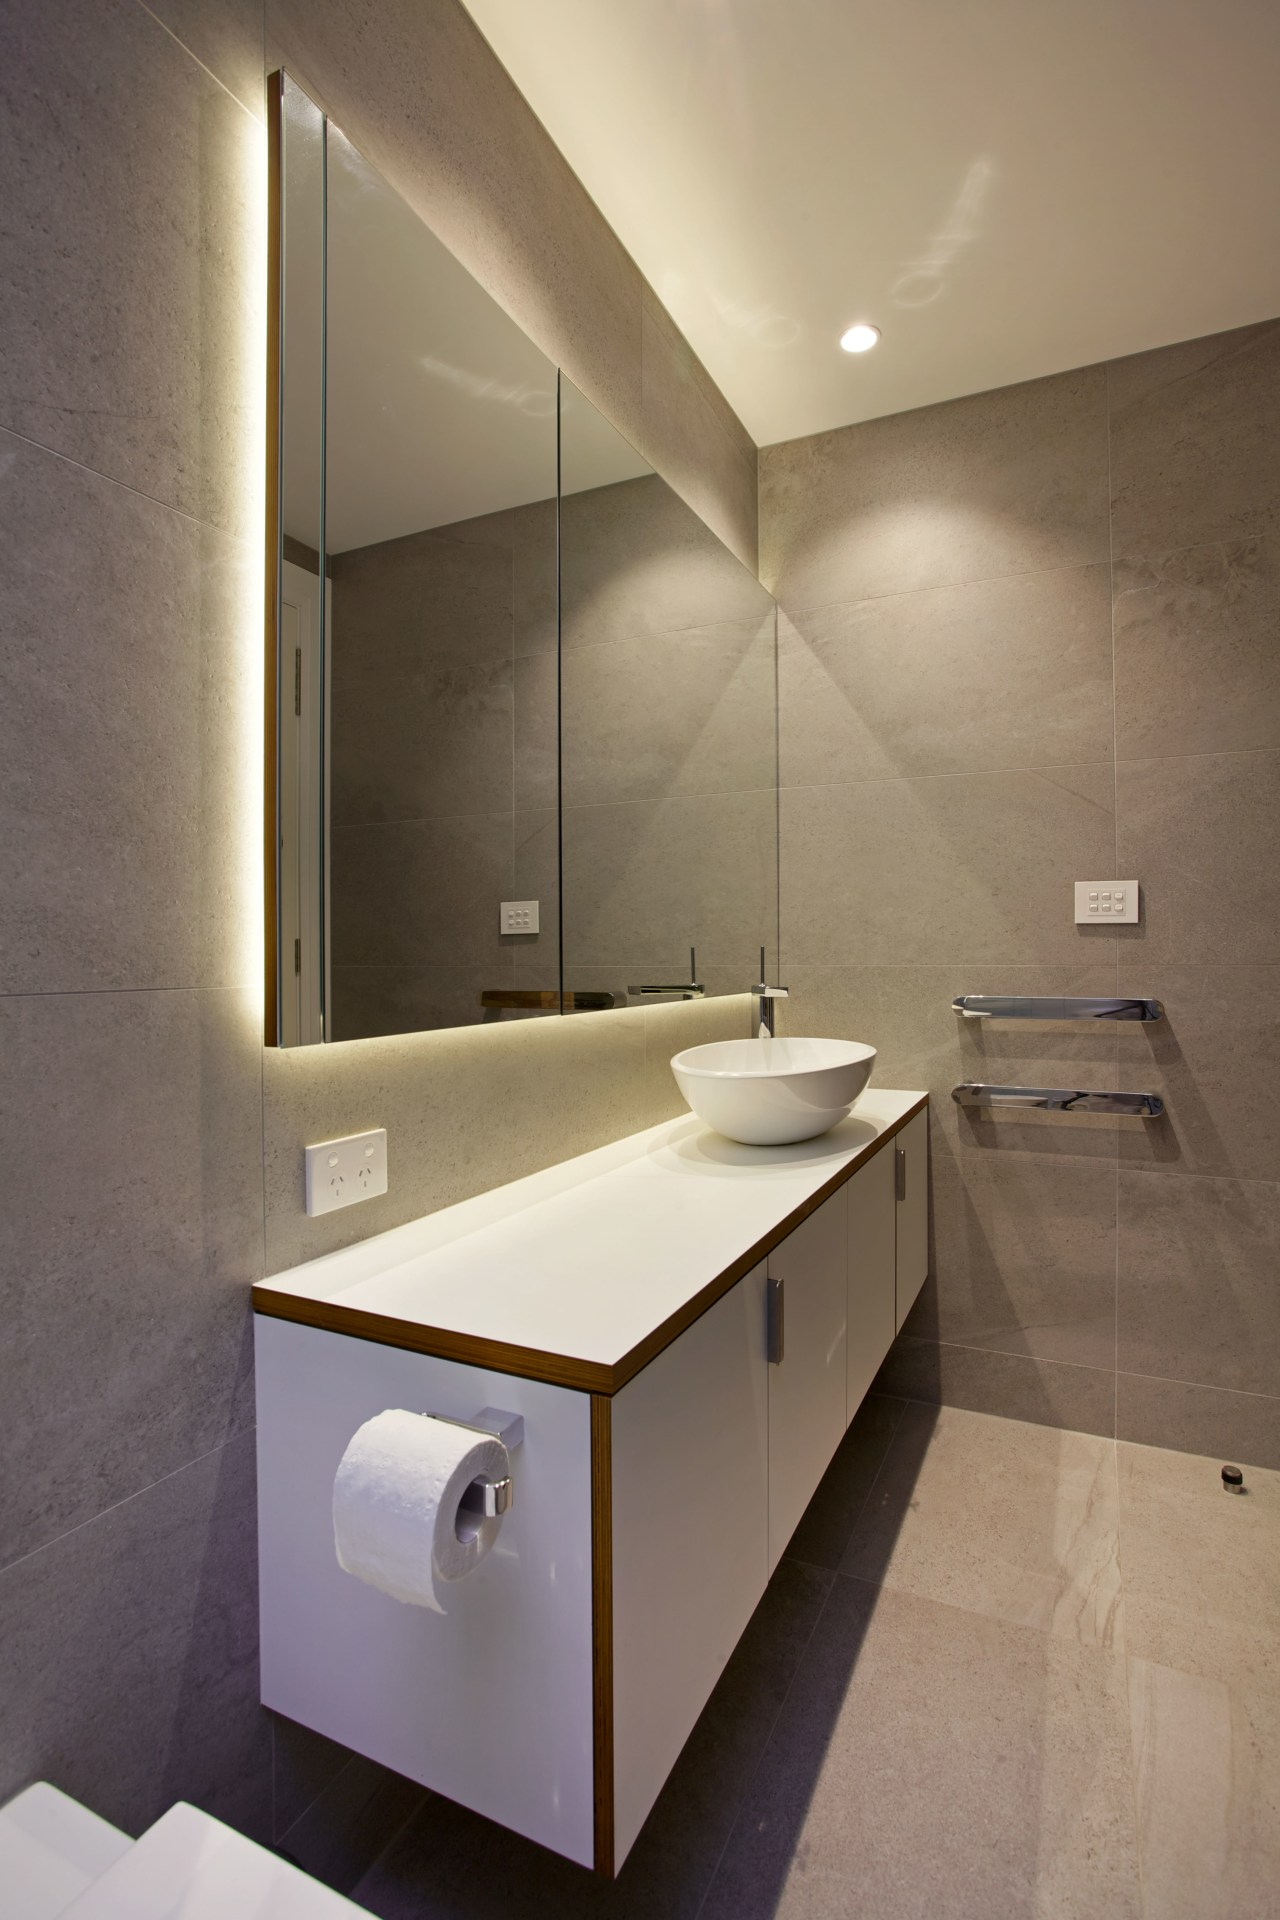 Futura plywood with an exposed endgrain defines the architecture, bathroom, bathroom accessory, bathroom cabinet, bathroom sink, floor, interior design, product design, room, sink, tap, brown, gray